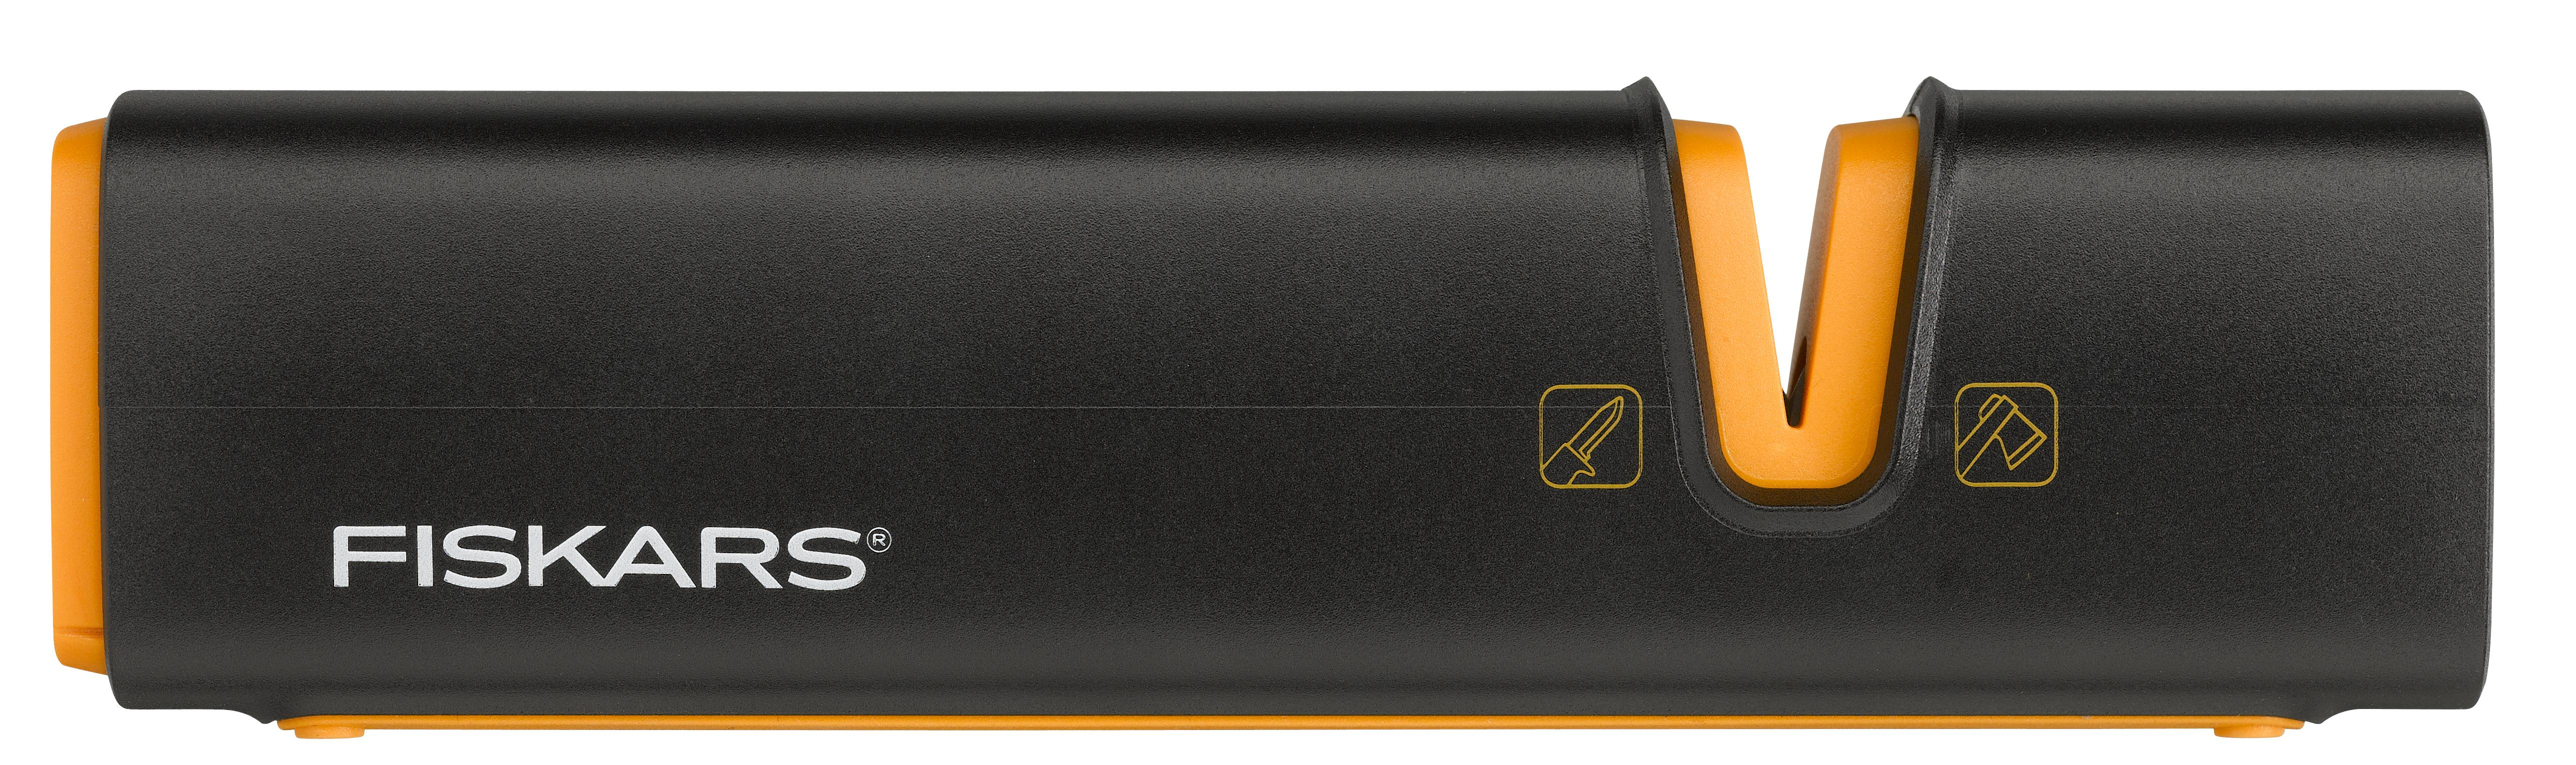 Точилка для топоров и ножей Fiskars 120740 xsharp для топоров и ножей цена